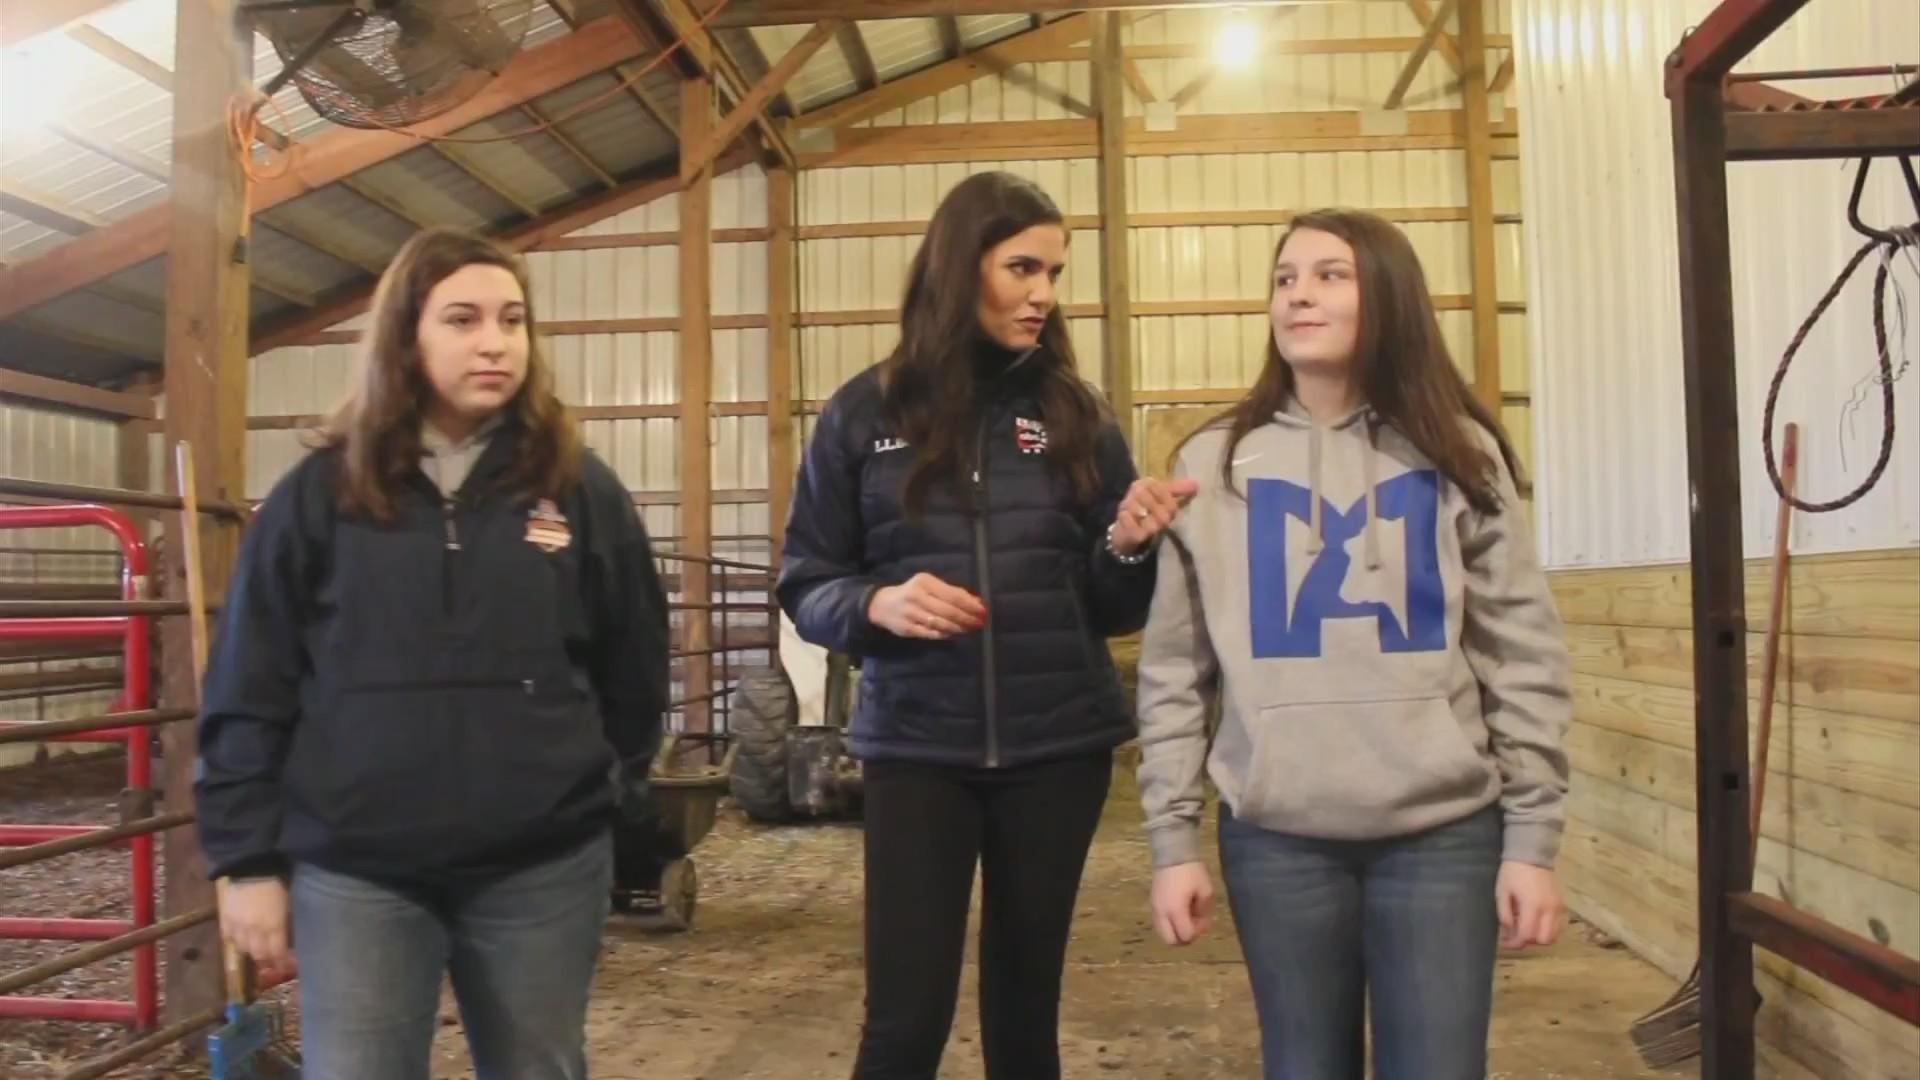 VIDEO: Sisters help represent future of female farmers